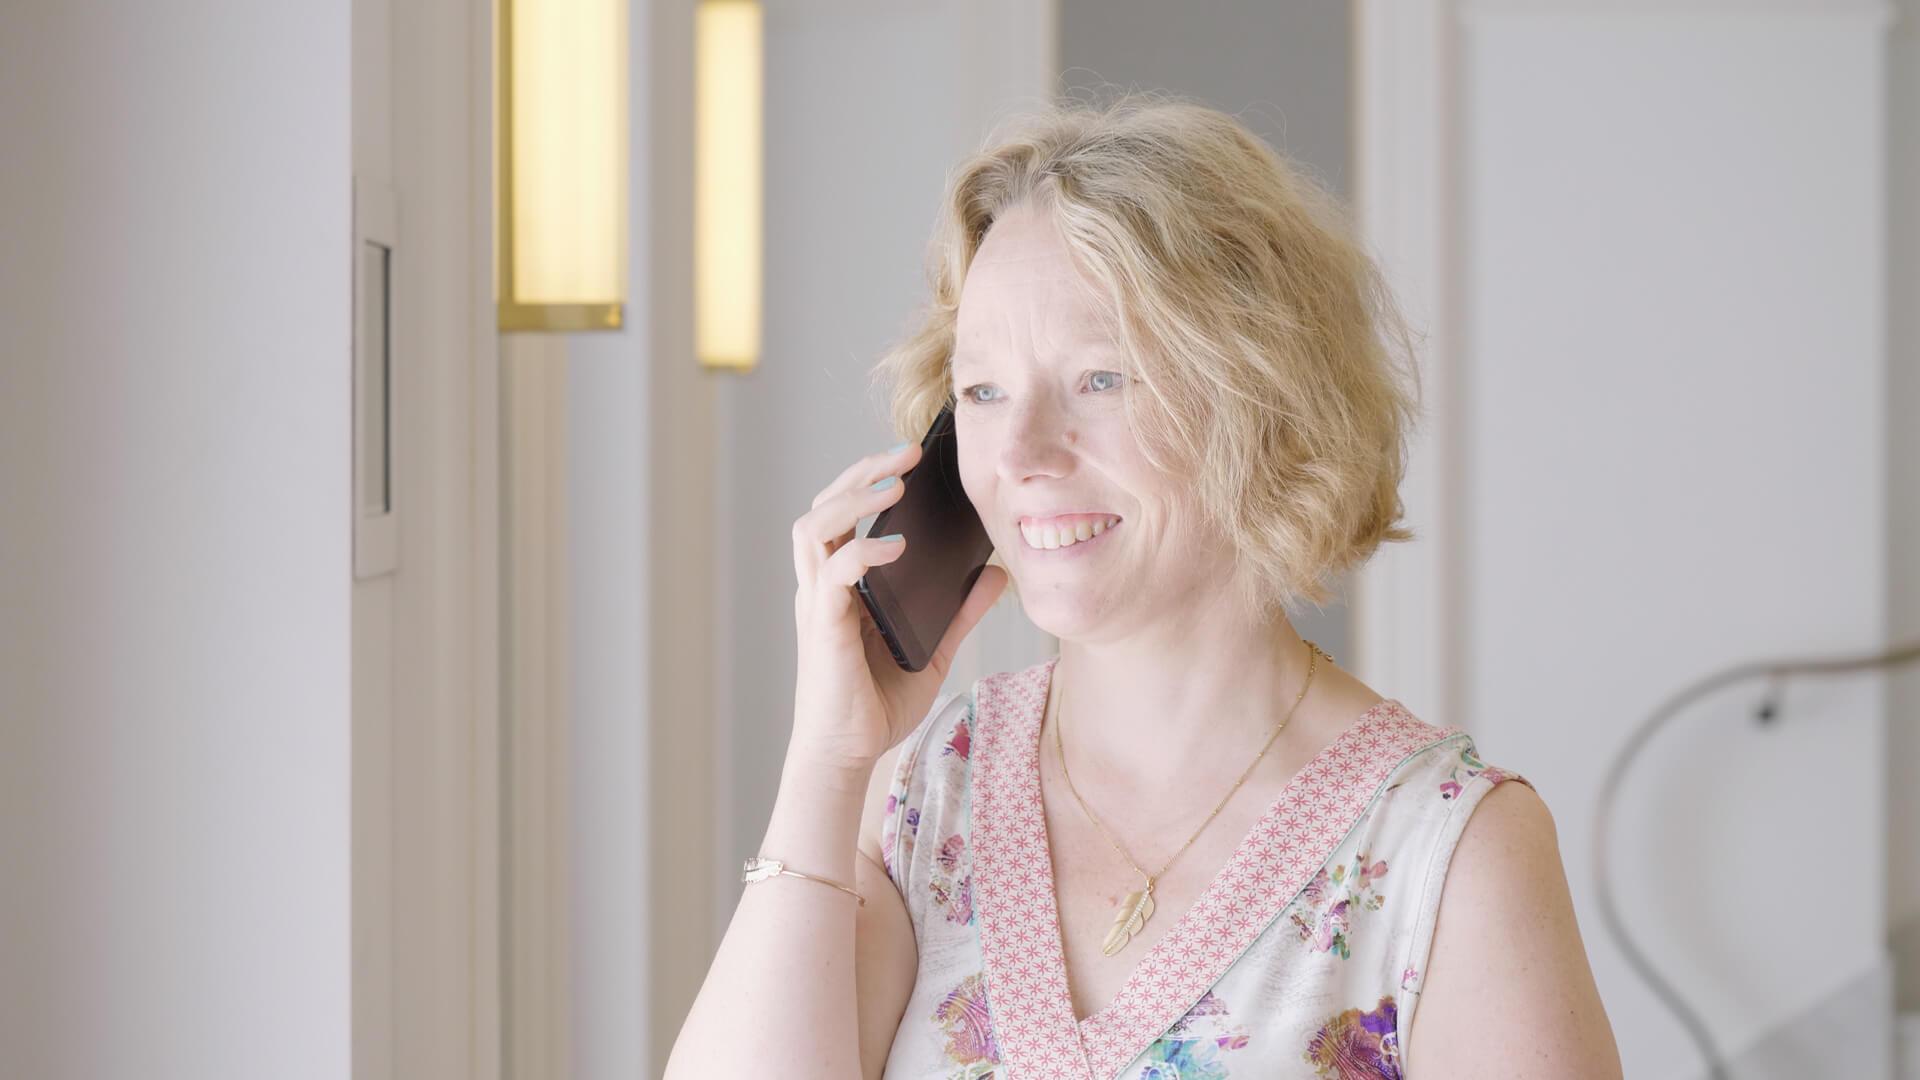 Annika talking on the phone